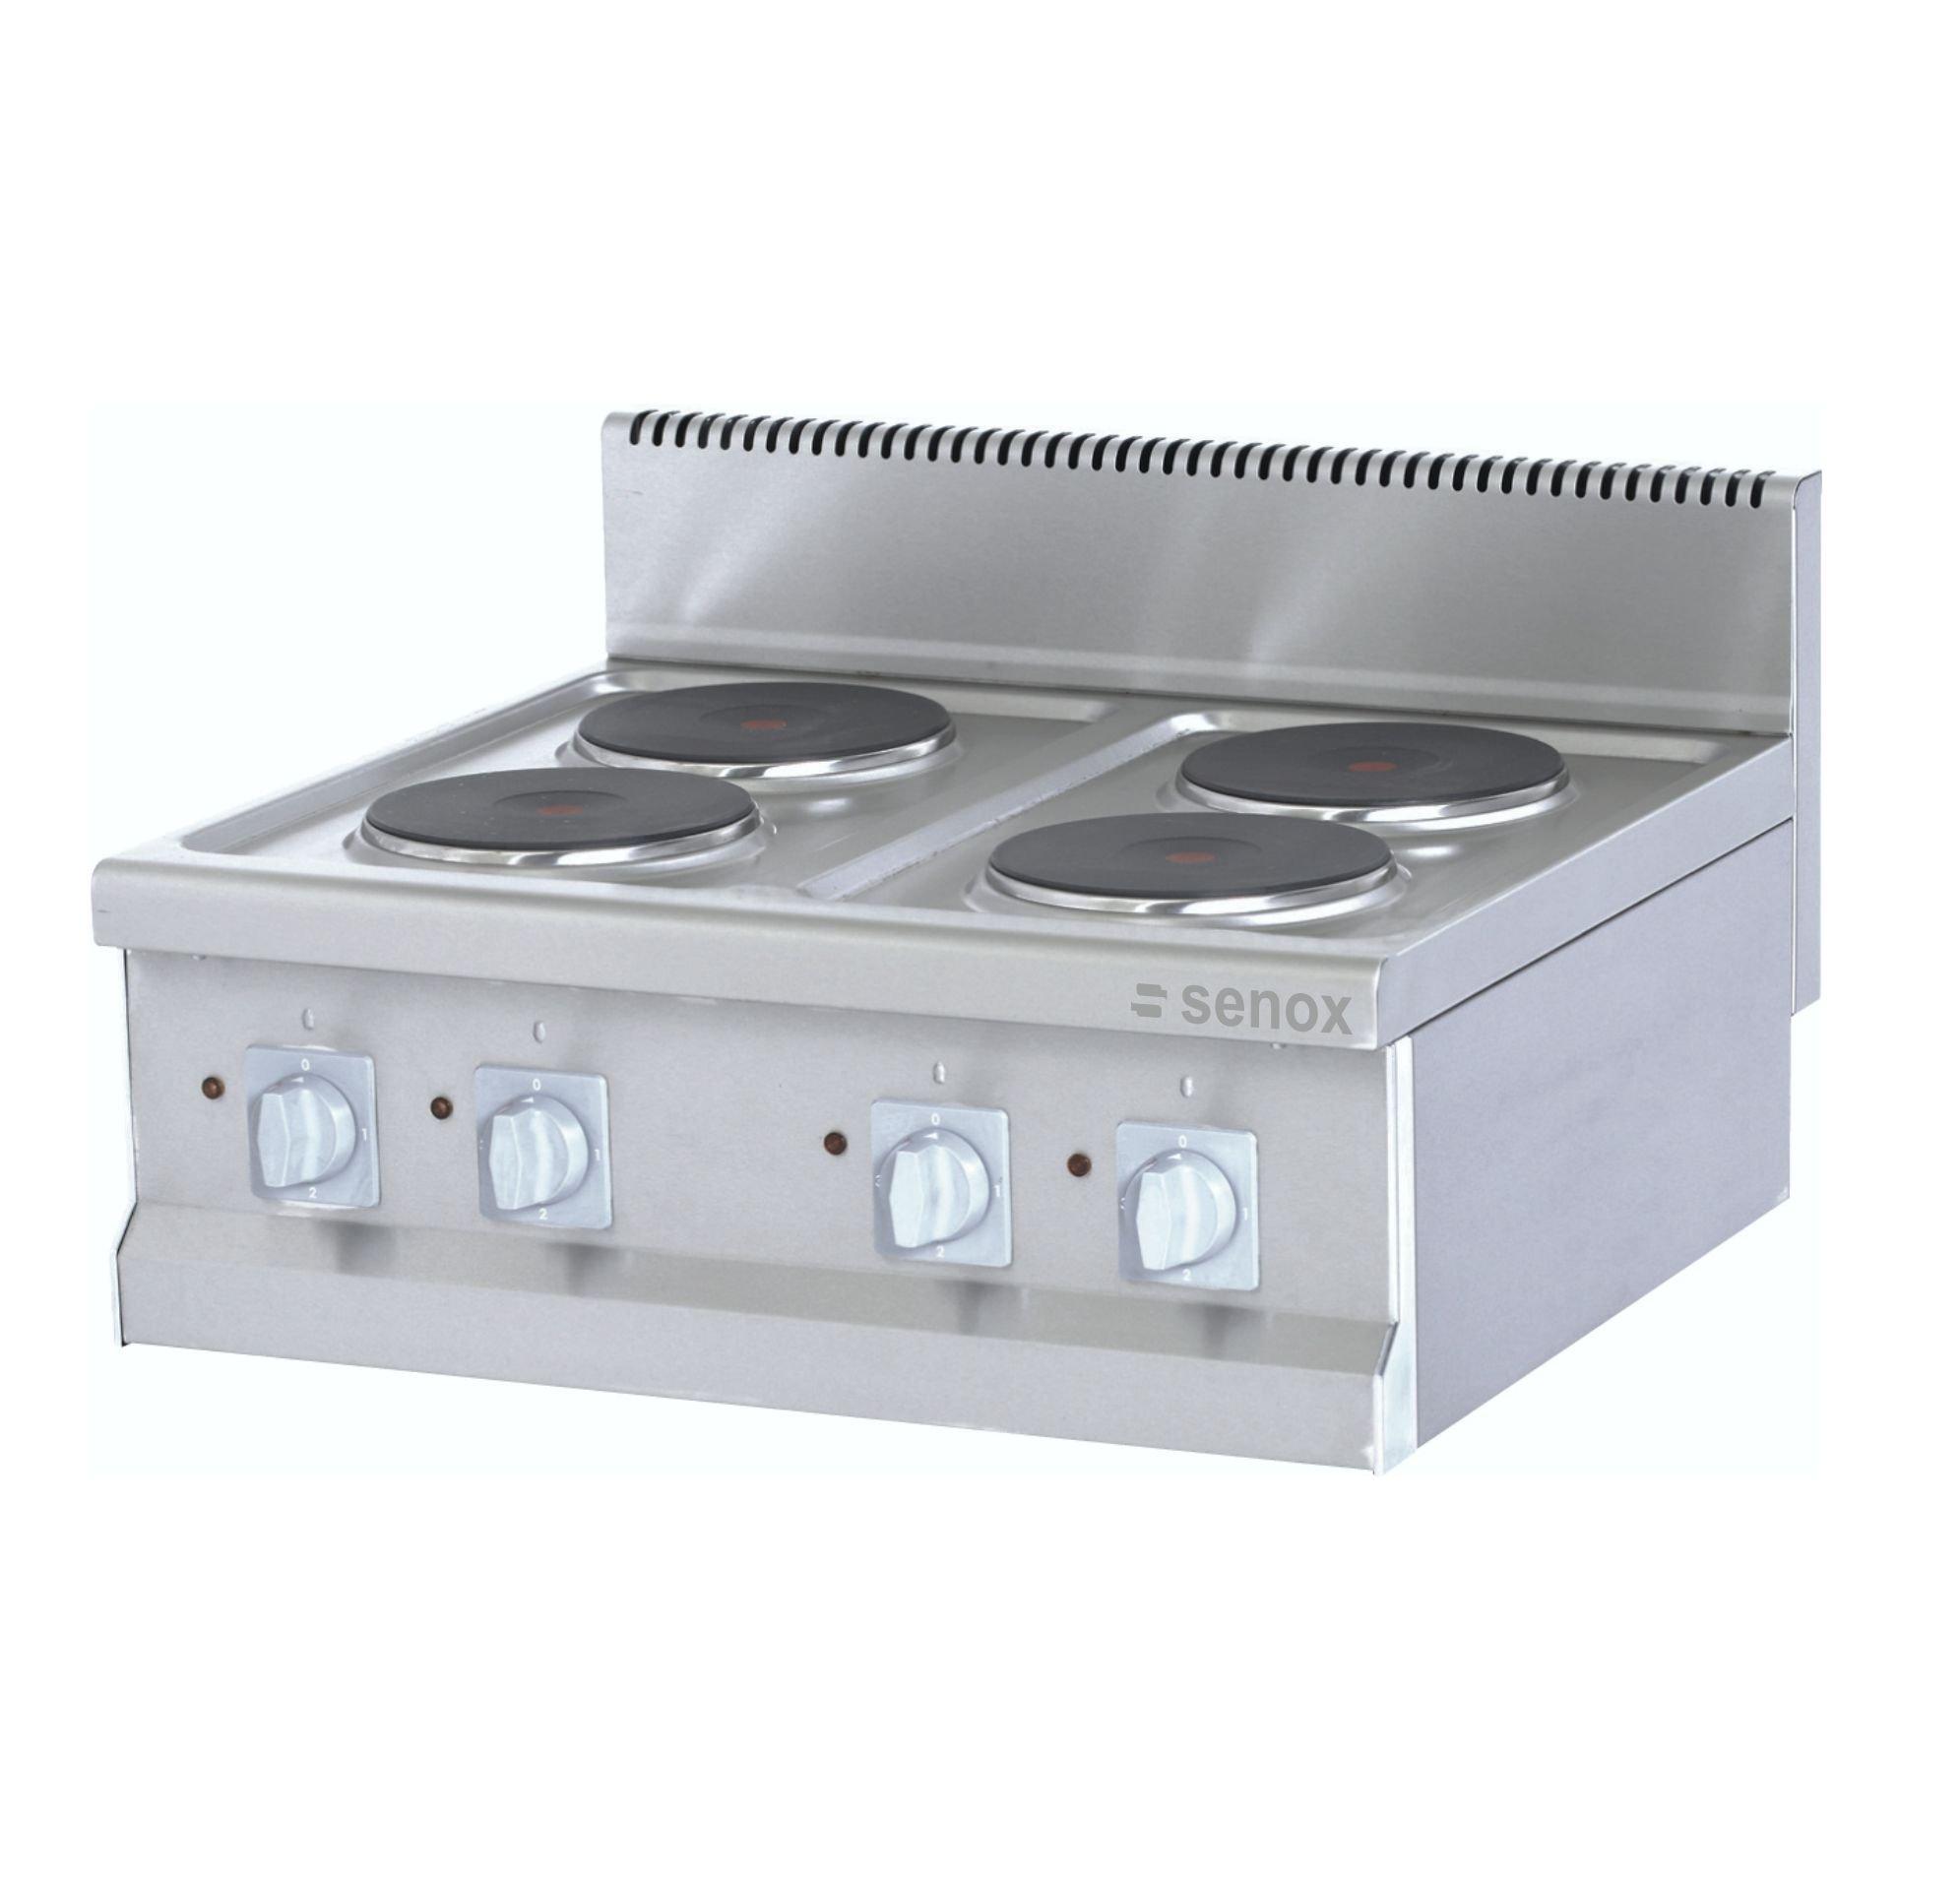 senox-aeo-870-setustu-elektrikli-ocak